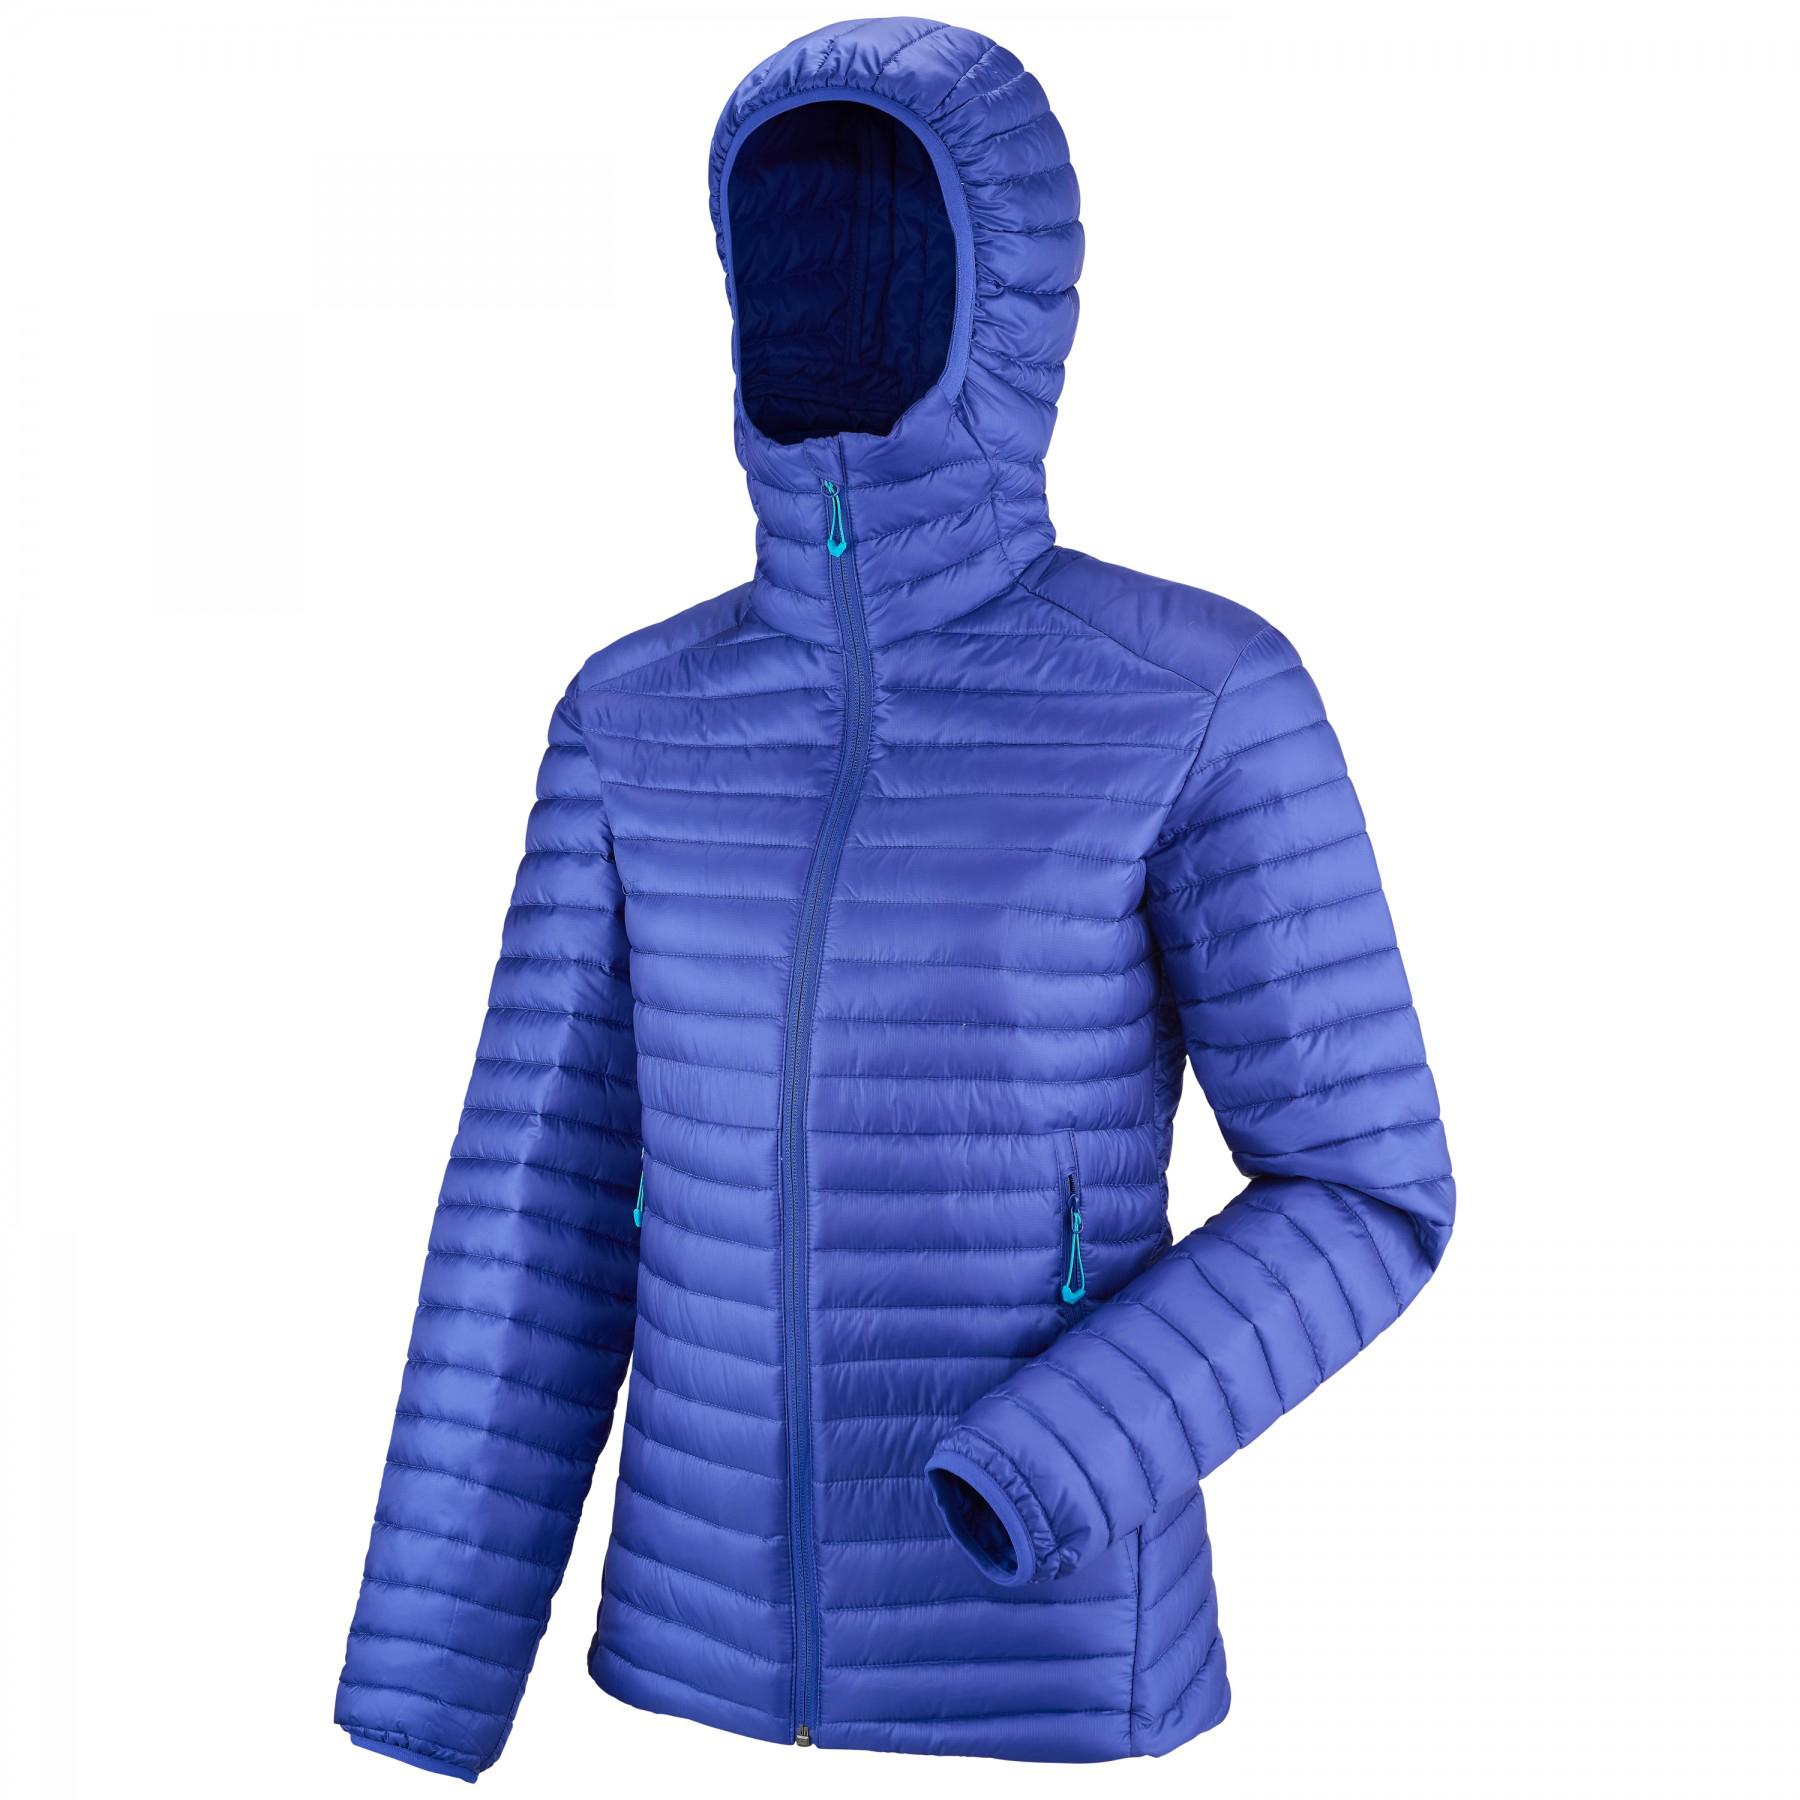 heel lift k down hoodie lightweight jacket Manufacturers, heel lift k down hoodie lightweight jacket Factory, Supply heel lift k down hoodie lightweight jacket